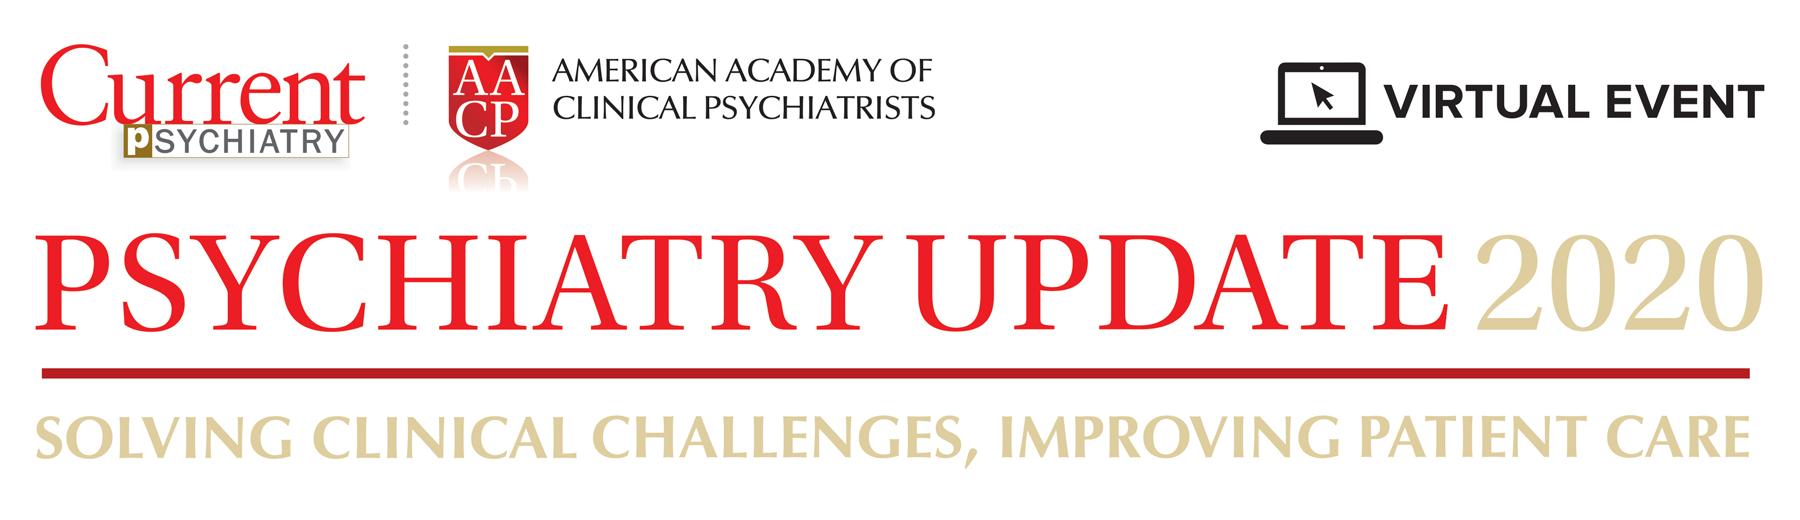 AACP/Current Psychiatry: Psychiatry Update Live Bonus CME/CE Presentation